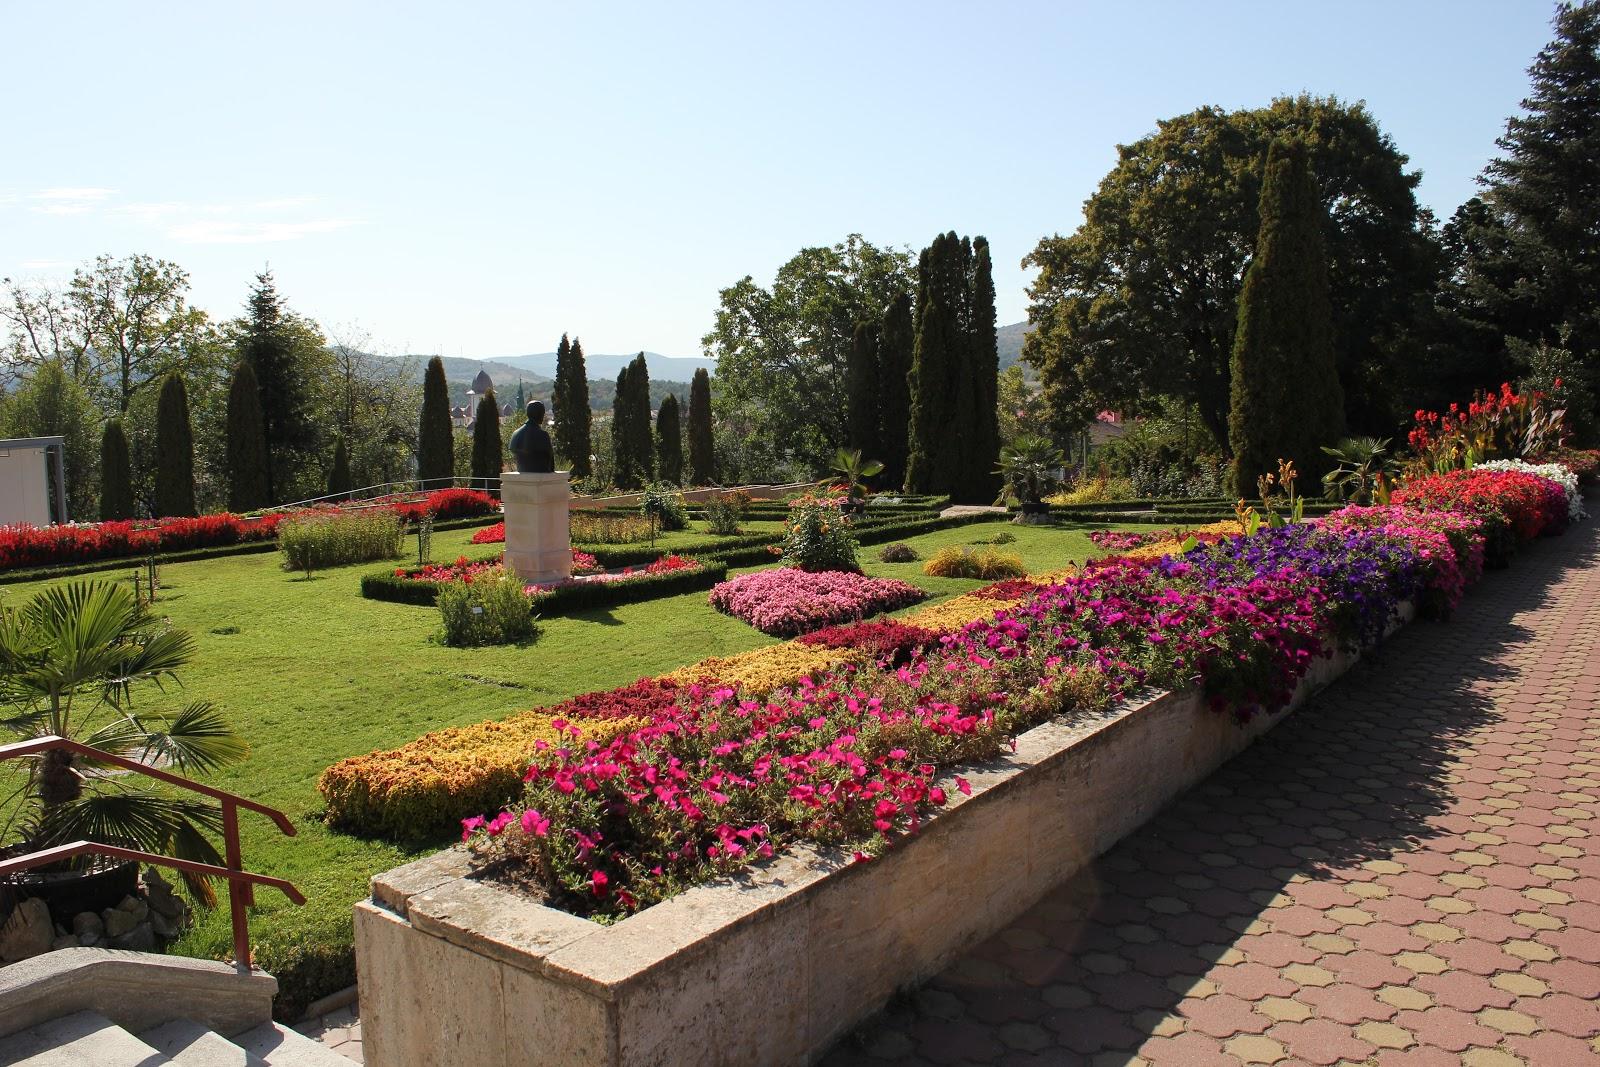 Arte y jardiner a jard n bot nico vasile fati de jibou for Jardin botanico cursos